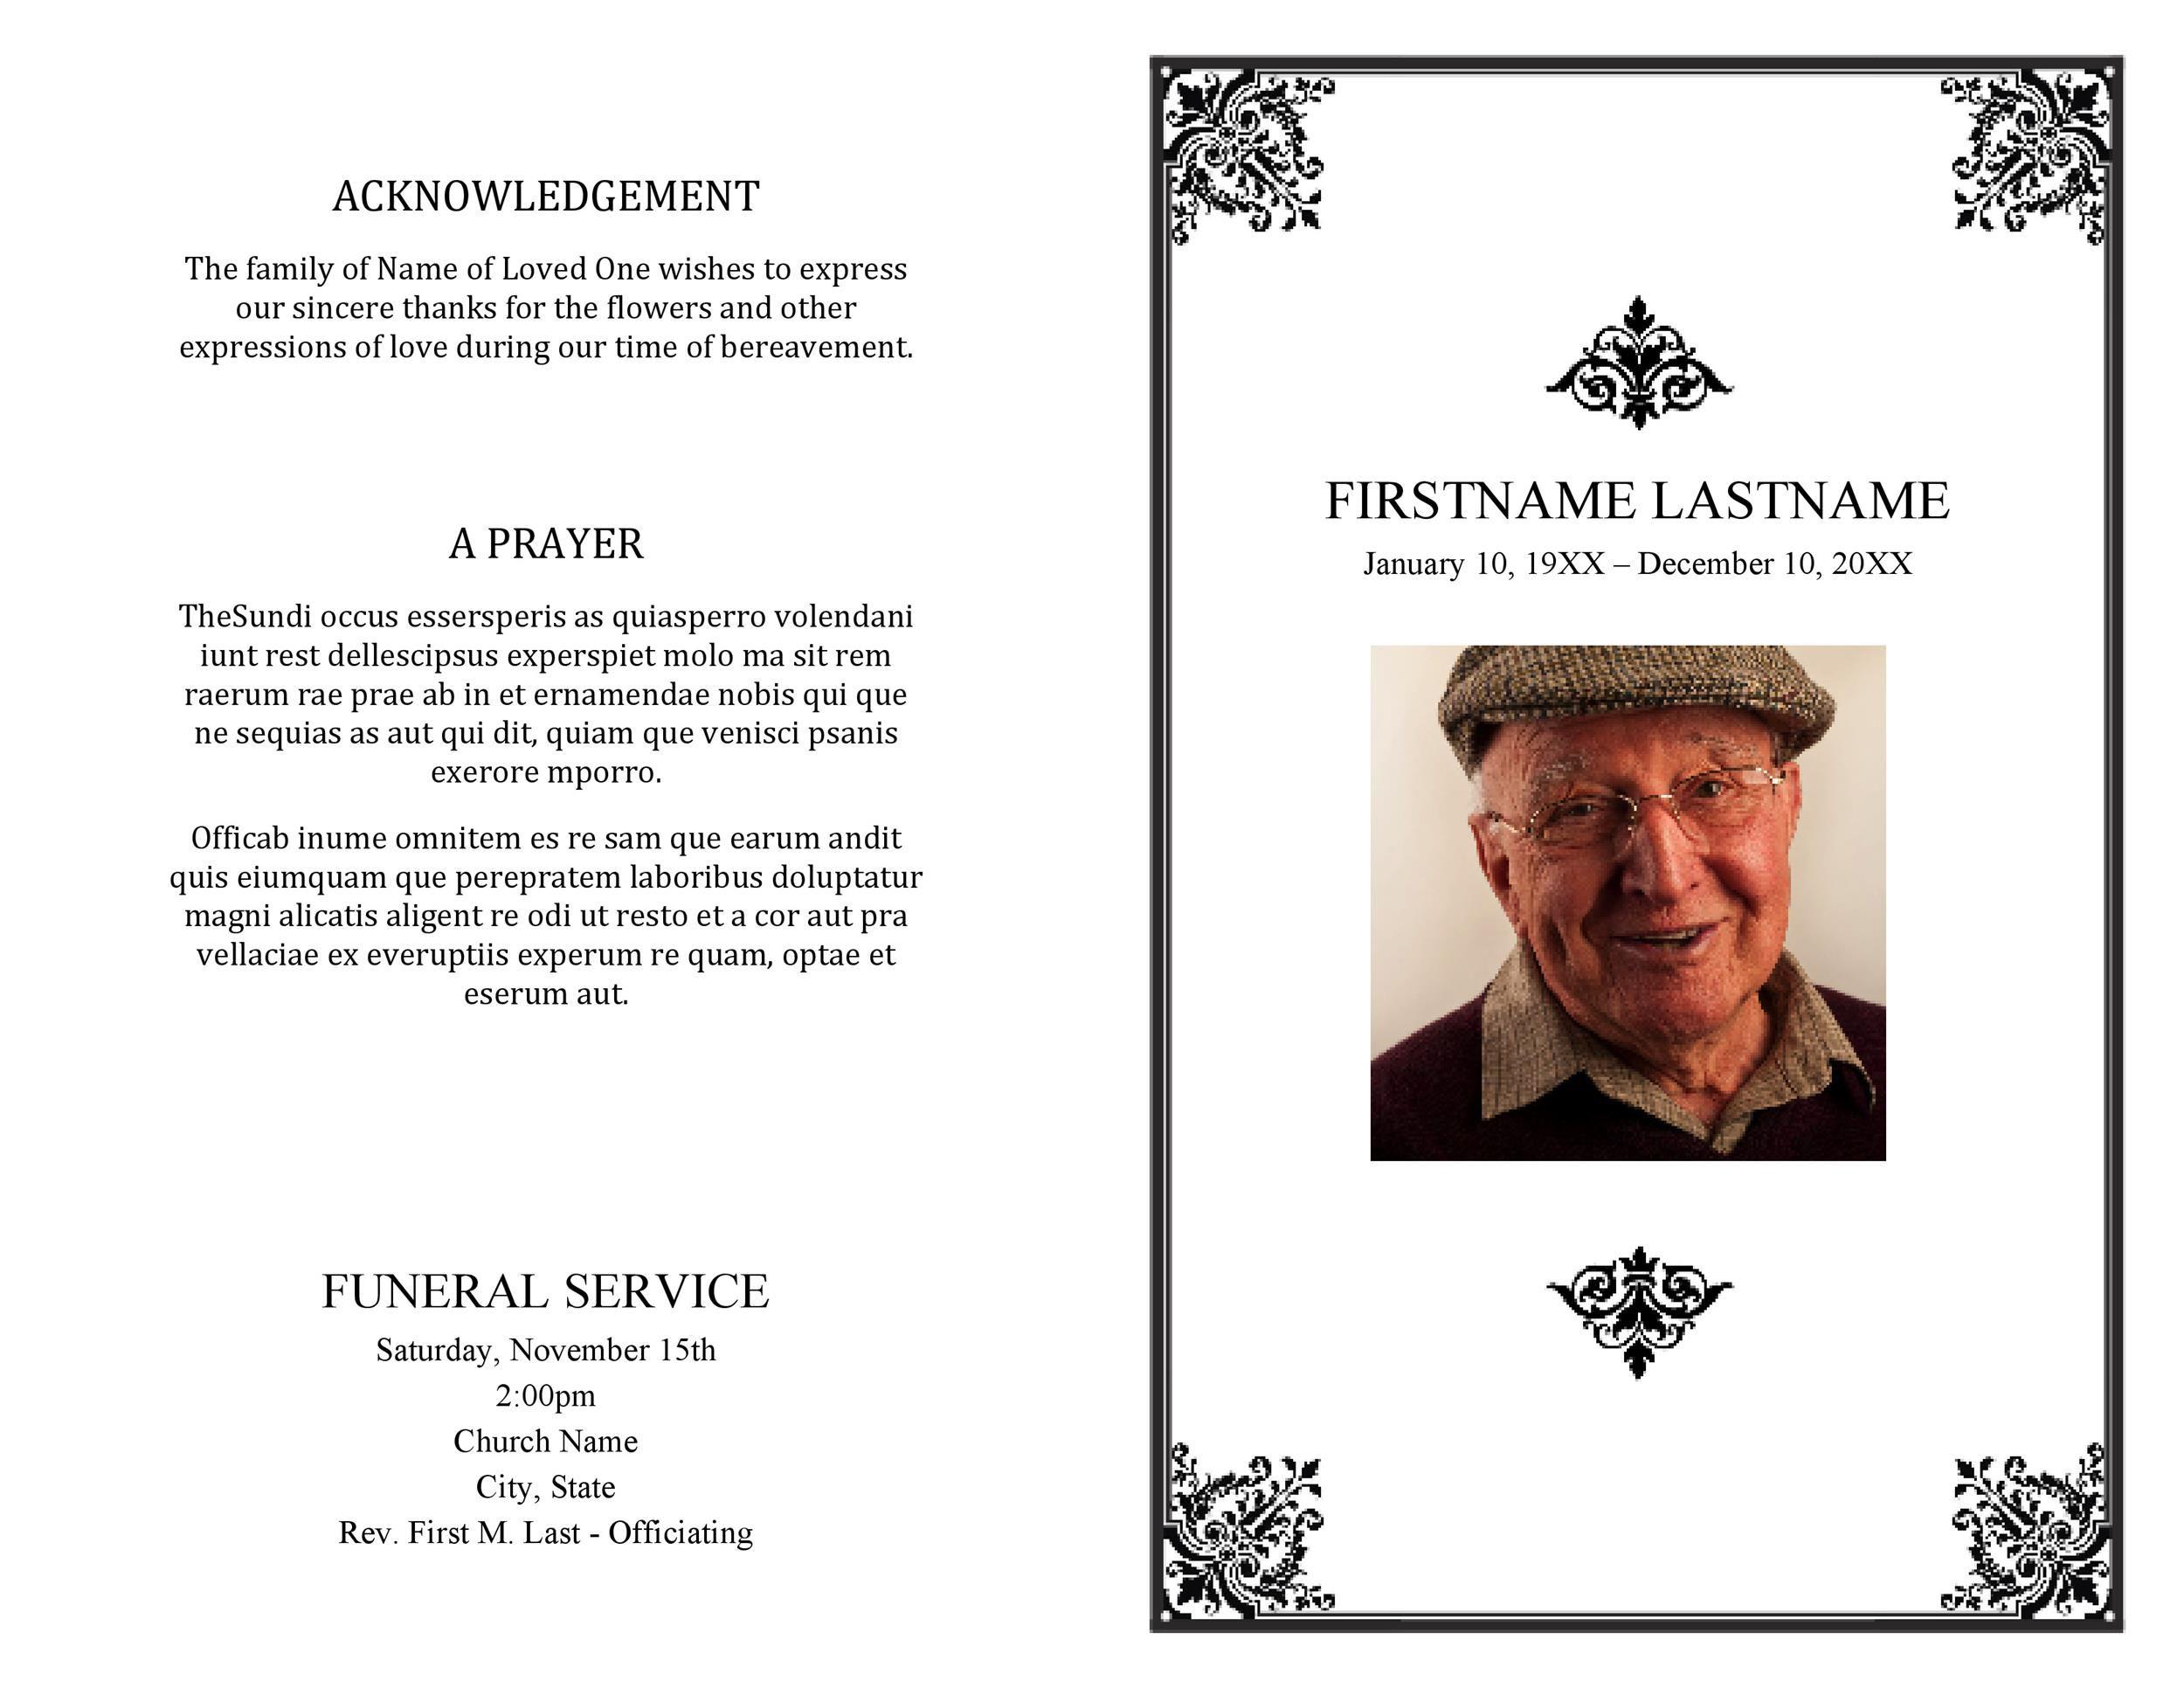 006 Amazing Free Funeral Program Template Photo  Word Catholic Editable PdfFull